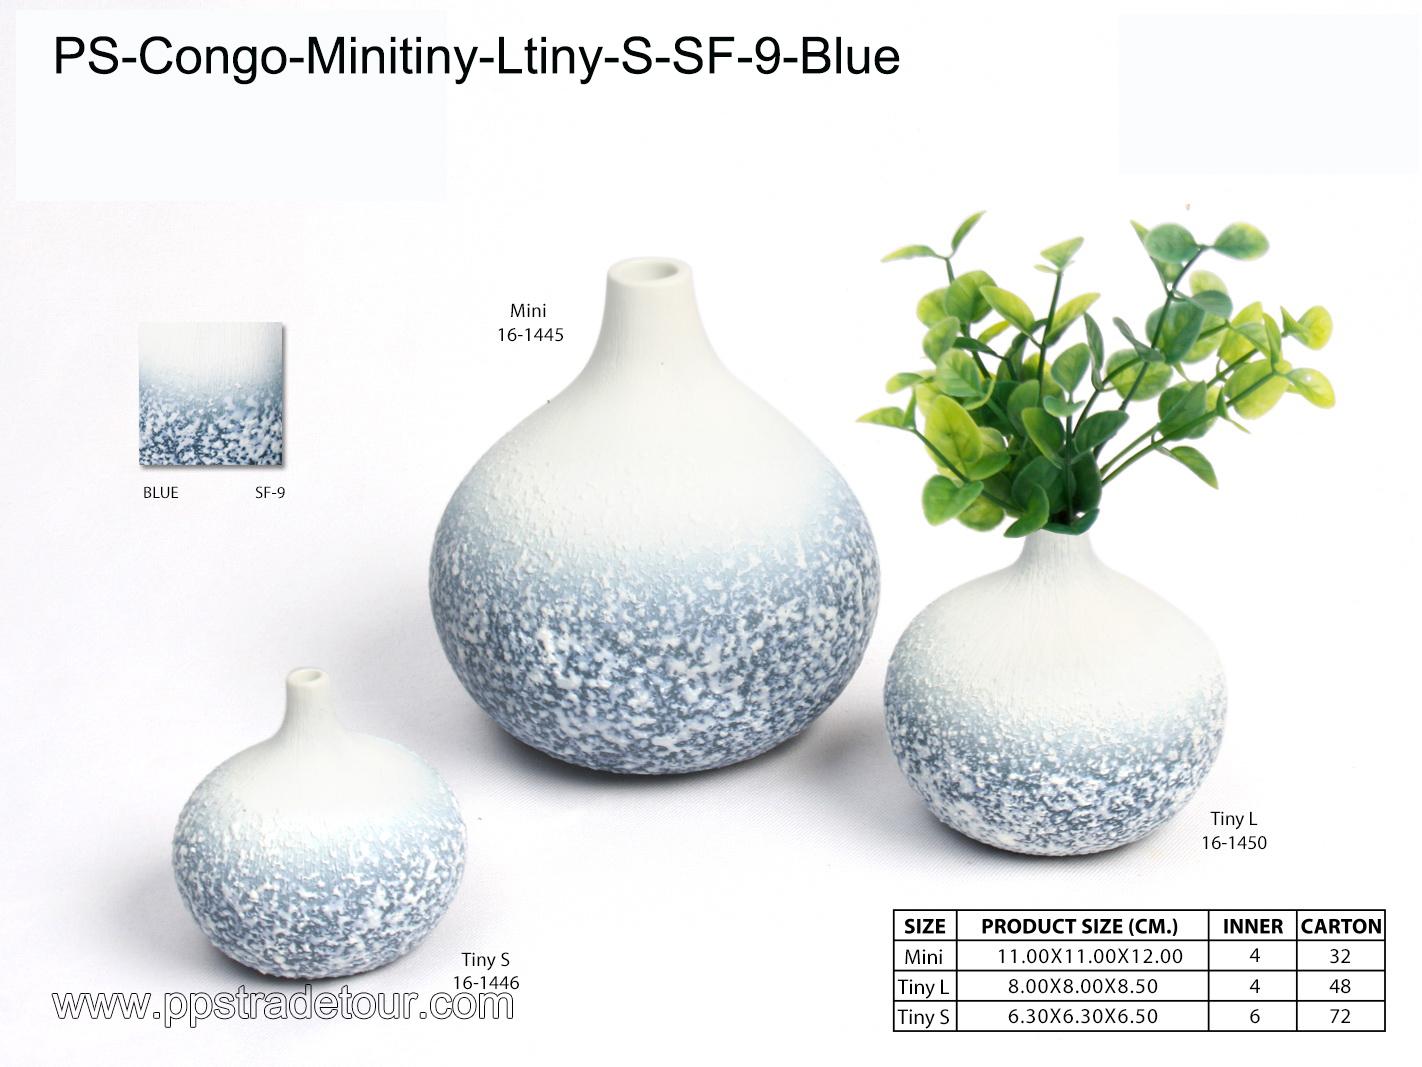 PSCV-CONGO-MINITINY-LTINY-S-SF-9-BLUE